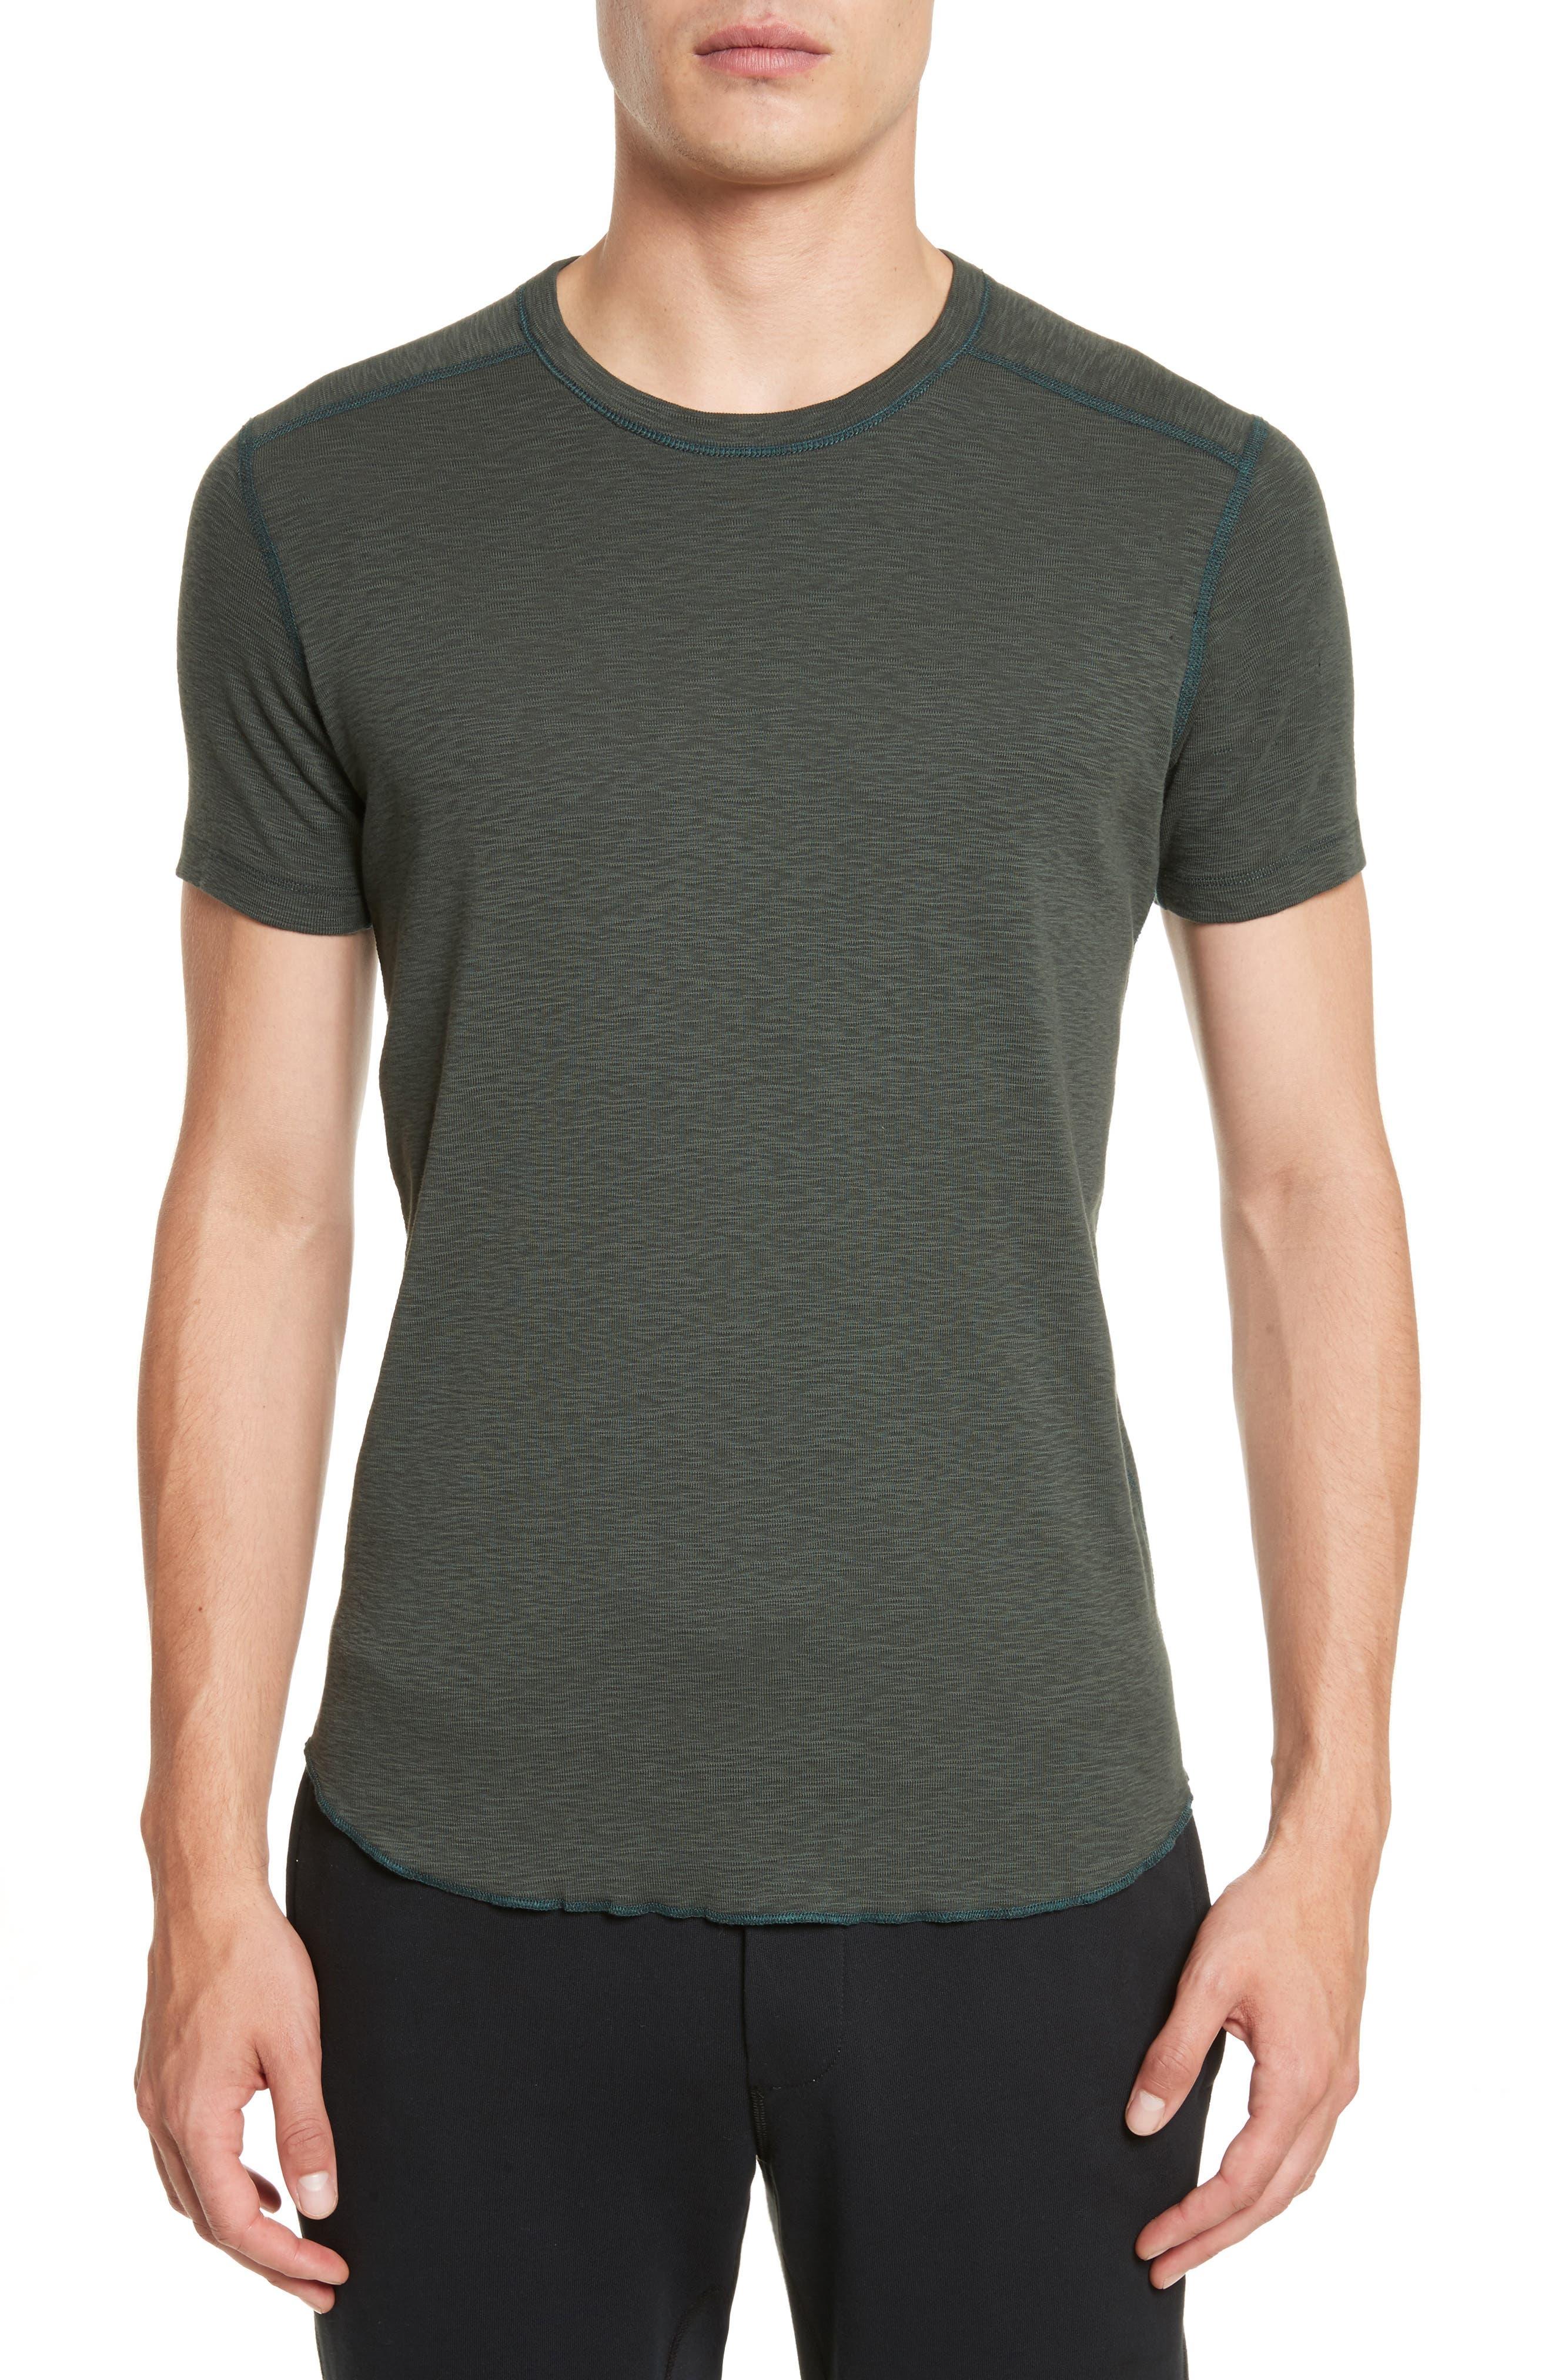 Alternate Image 1 Selected - wings + horns Ribbed Slub Cotton T-Shirt